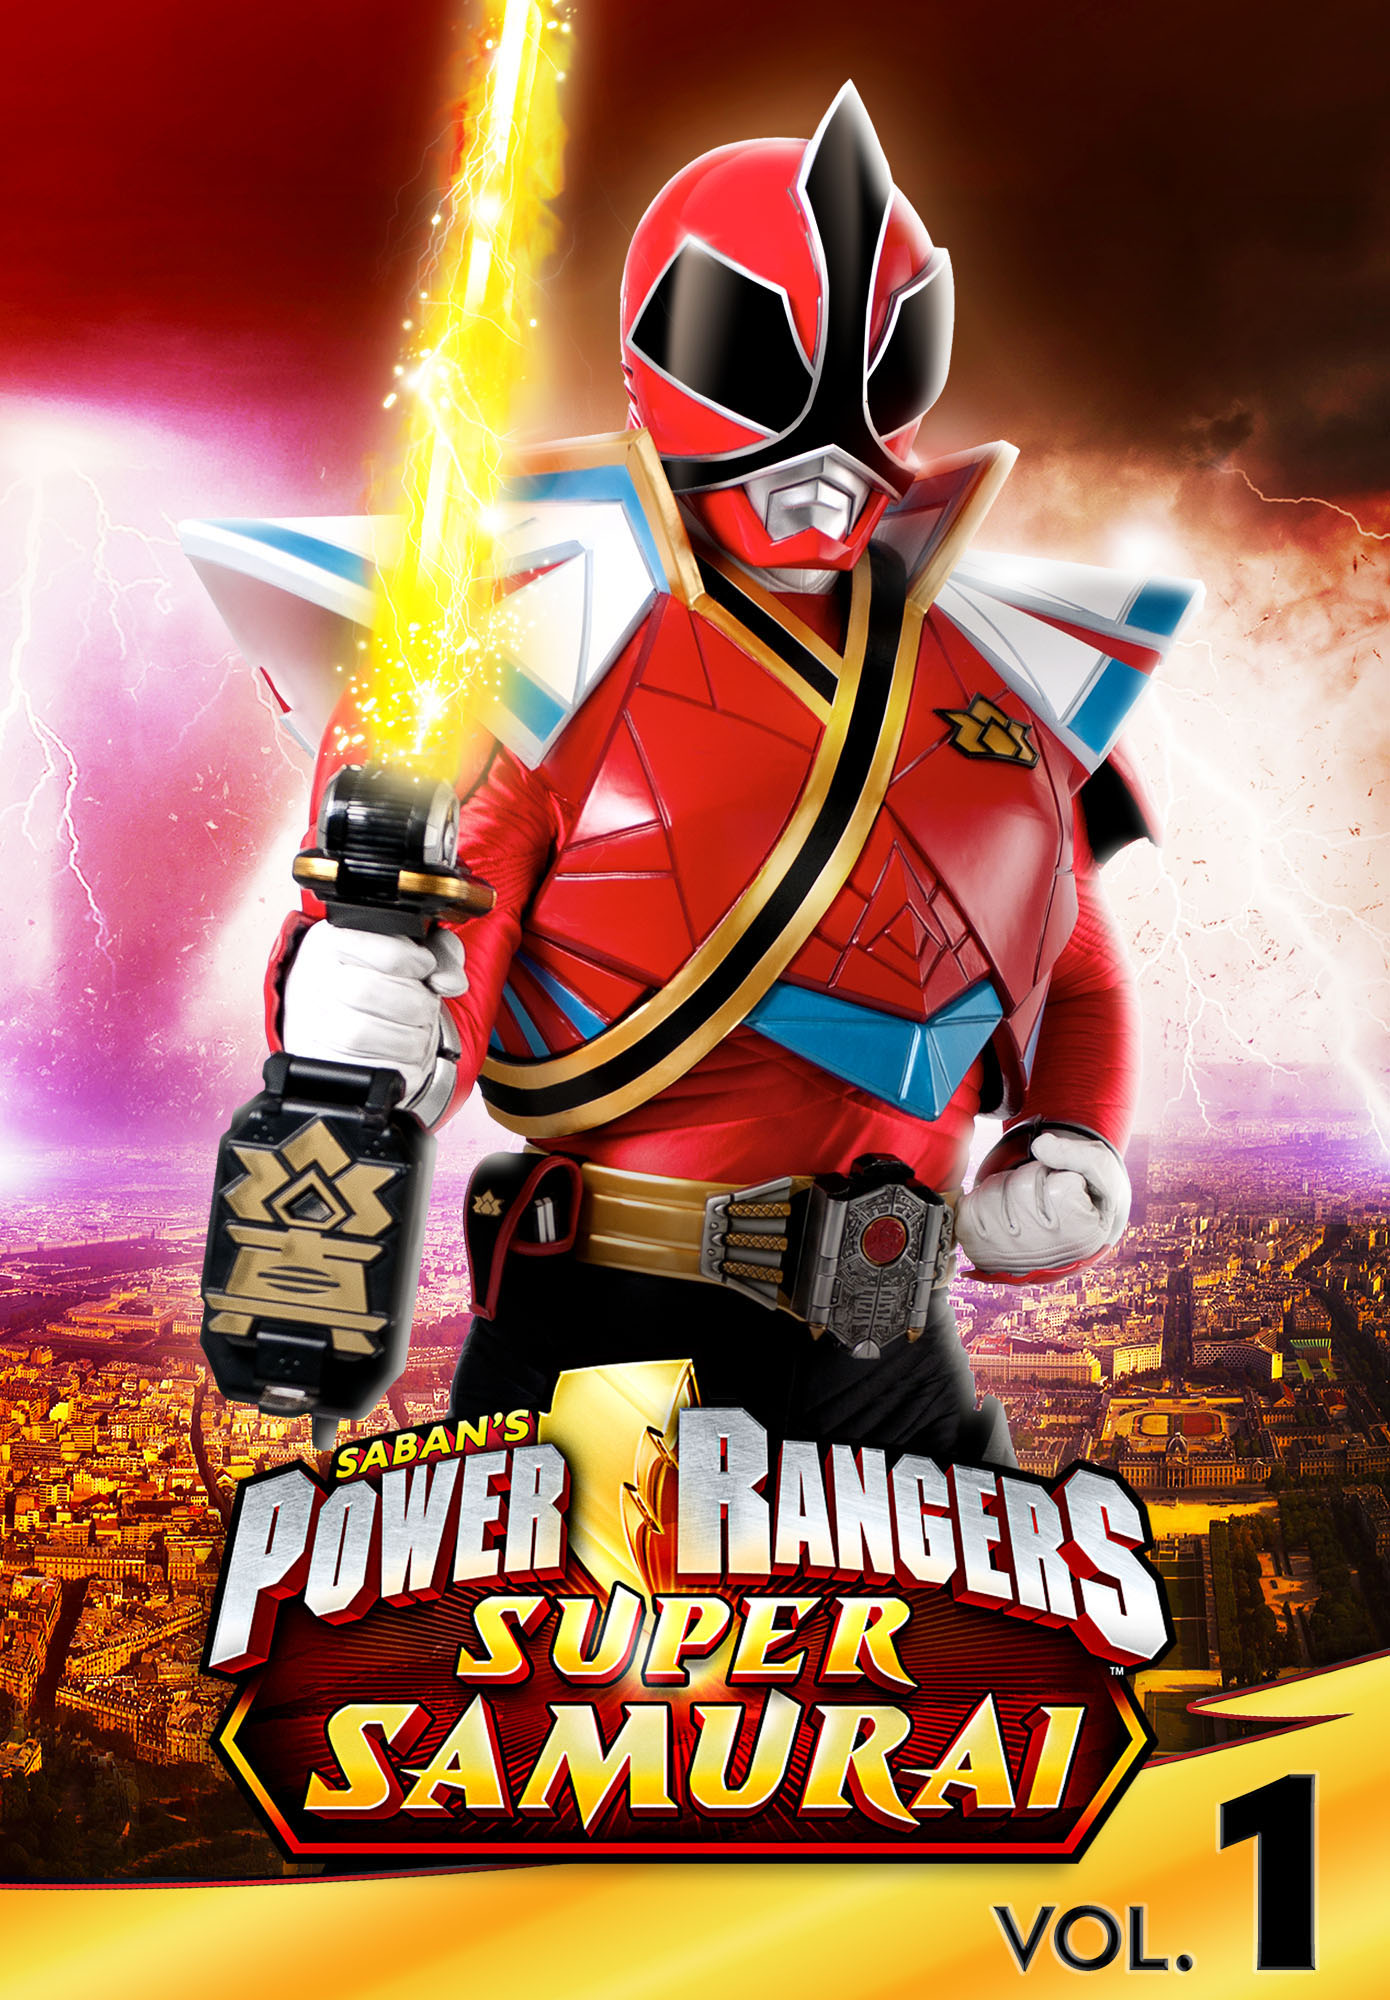 Buy Power Rangers Super Samurai Volume 1 The Super Powered